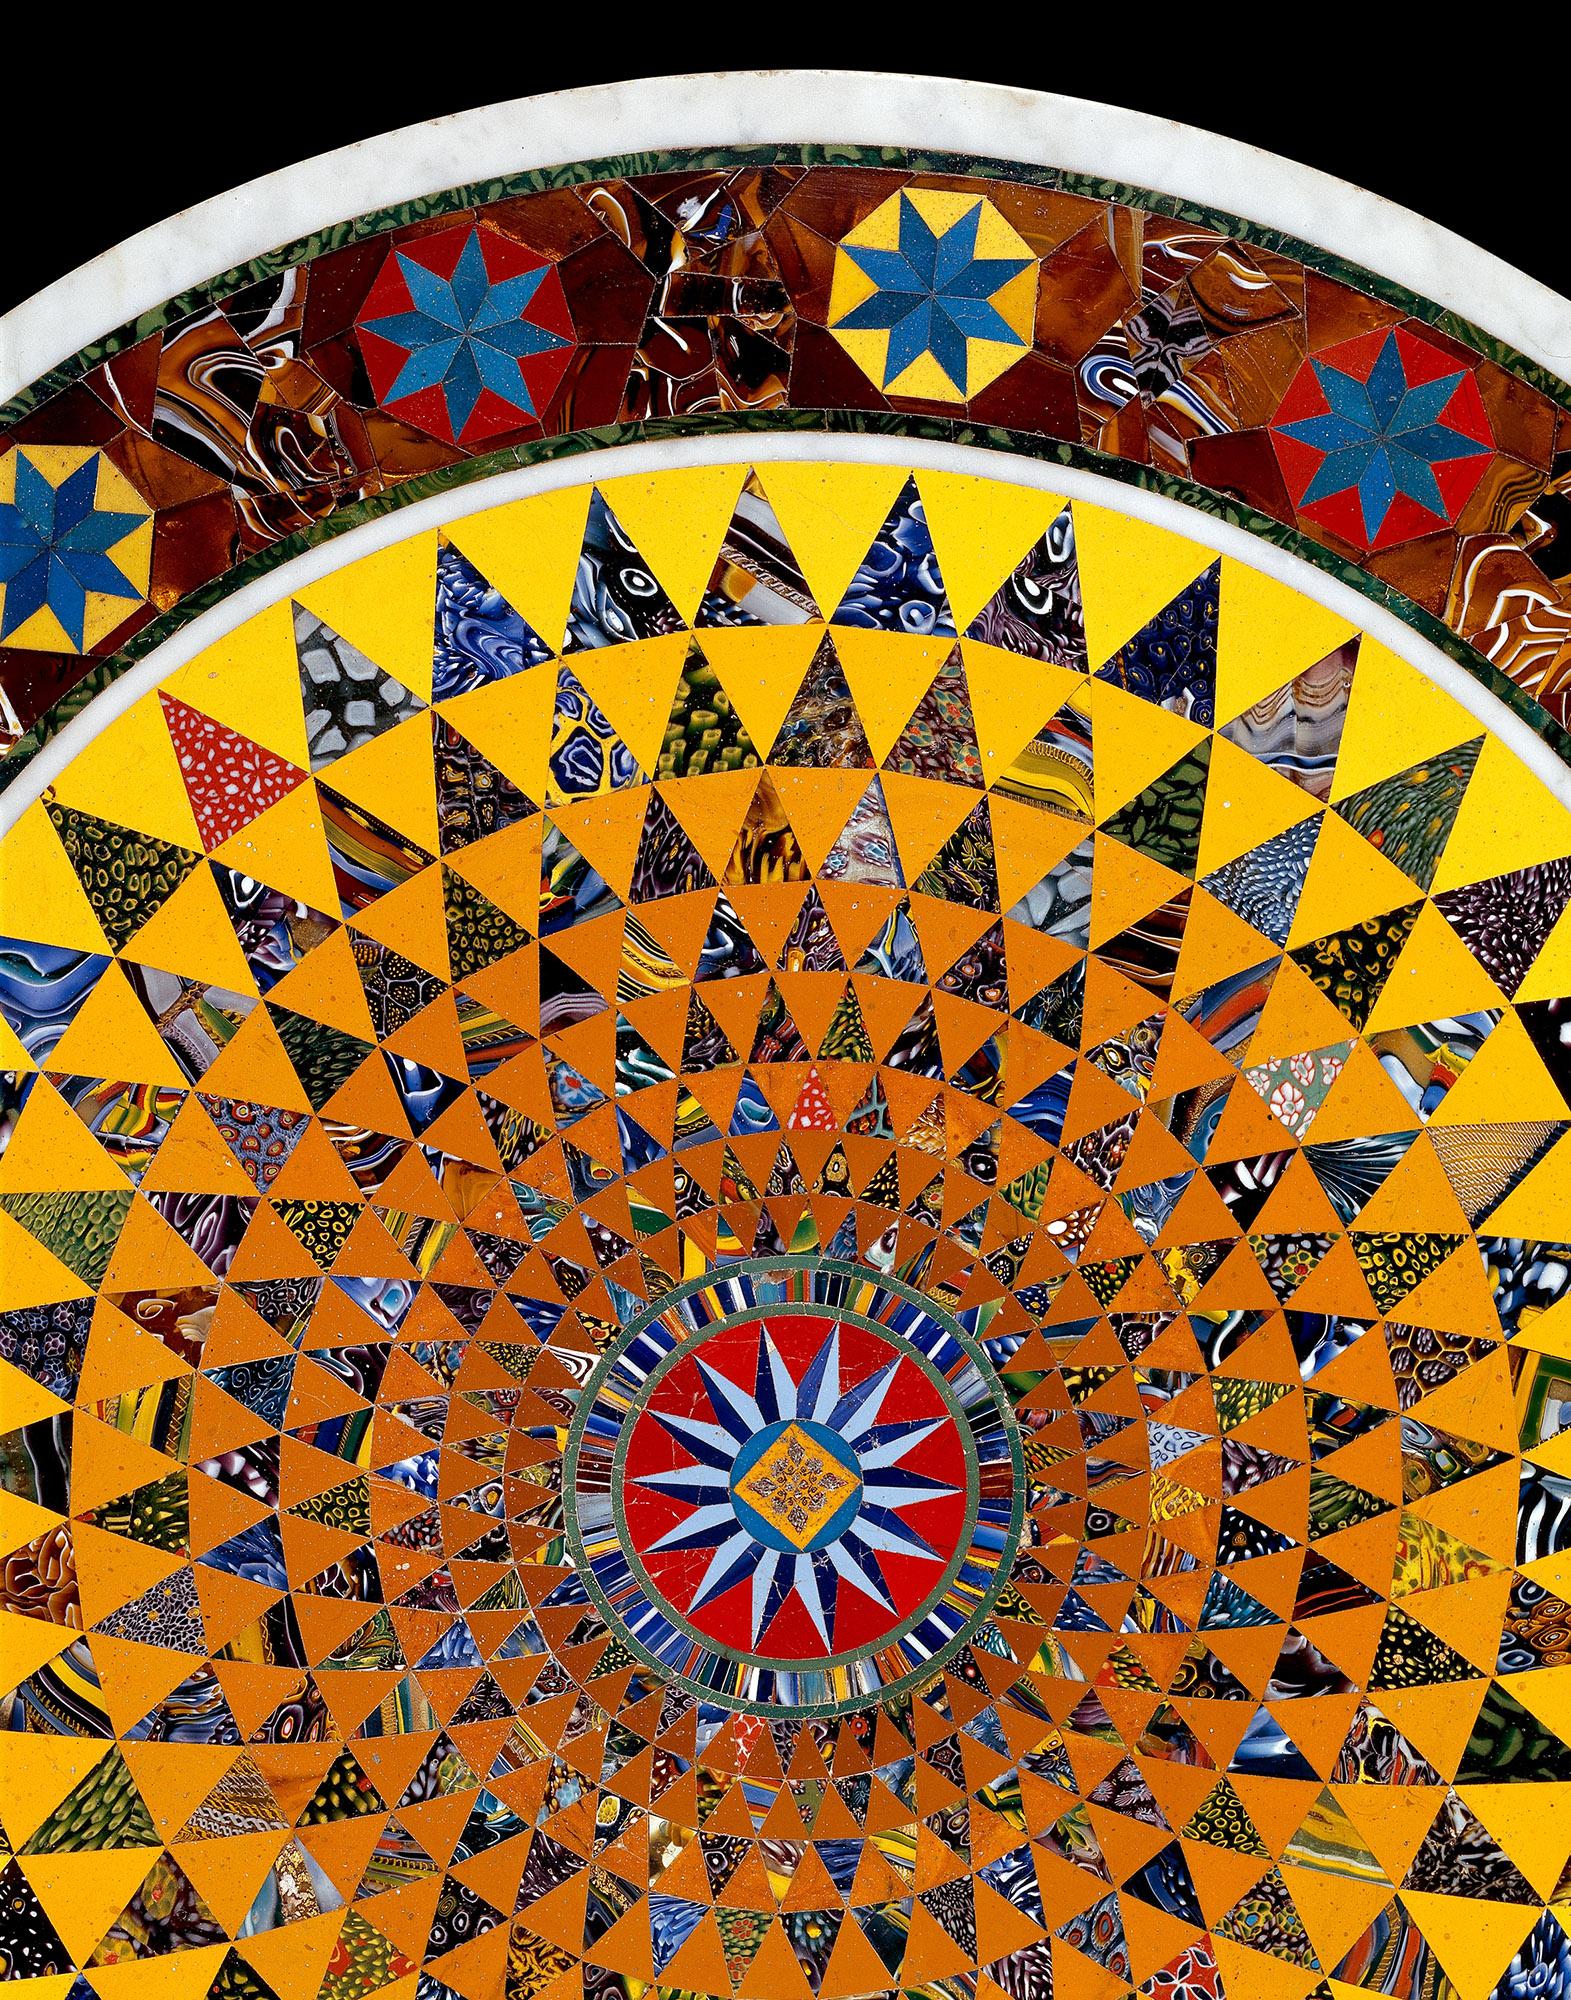 Mosaic Glass Tabletop (detail)